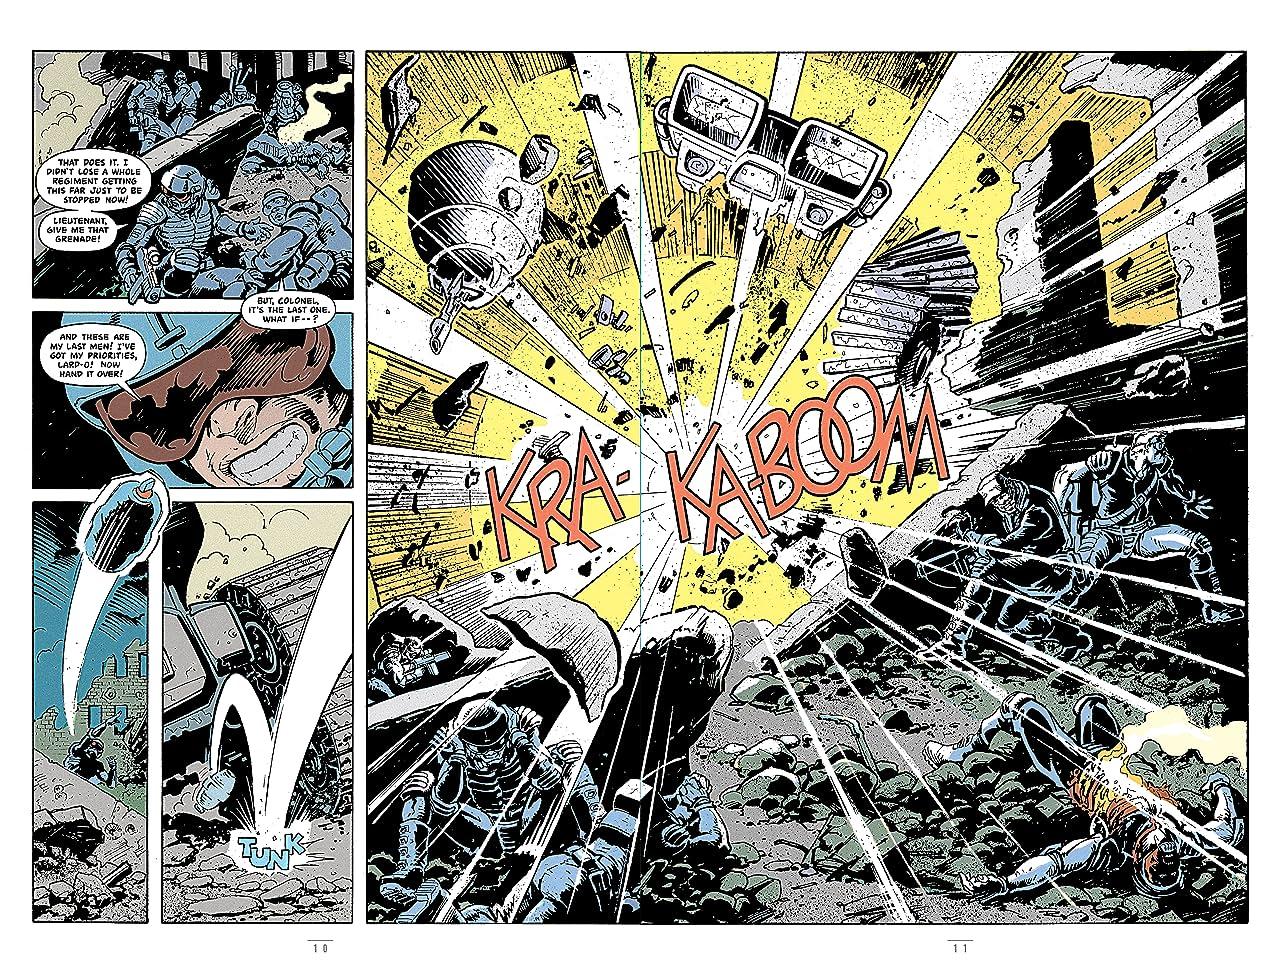 The Terminator: The Original Comics Series